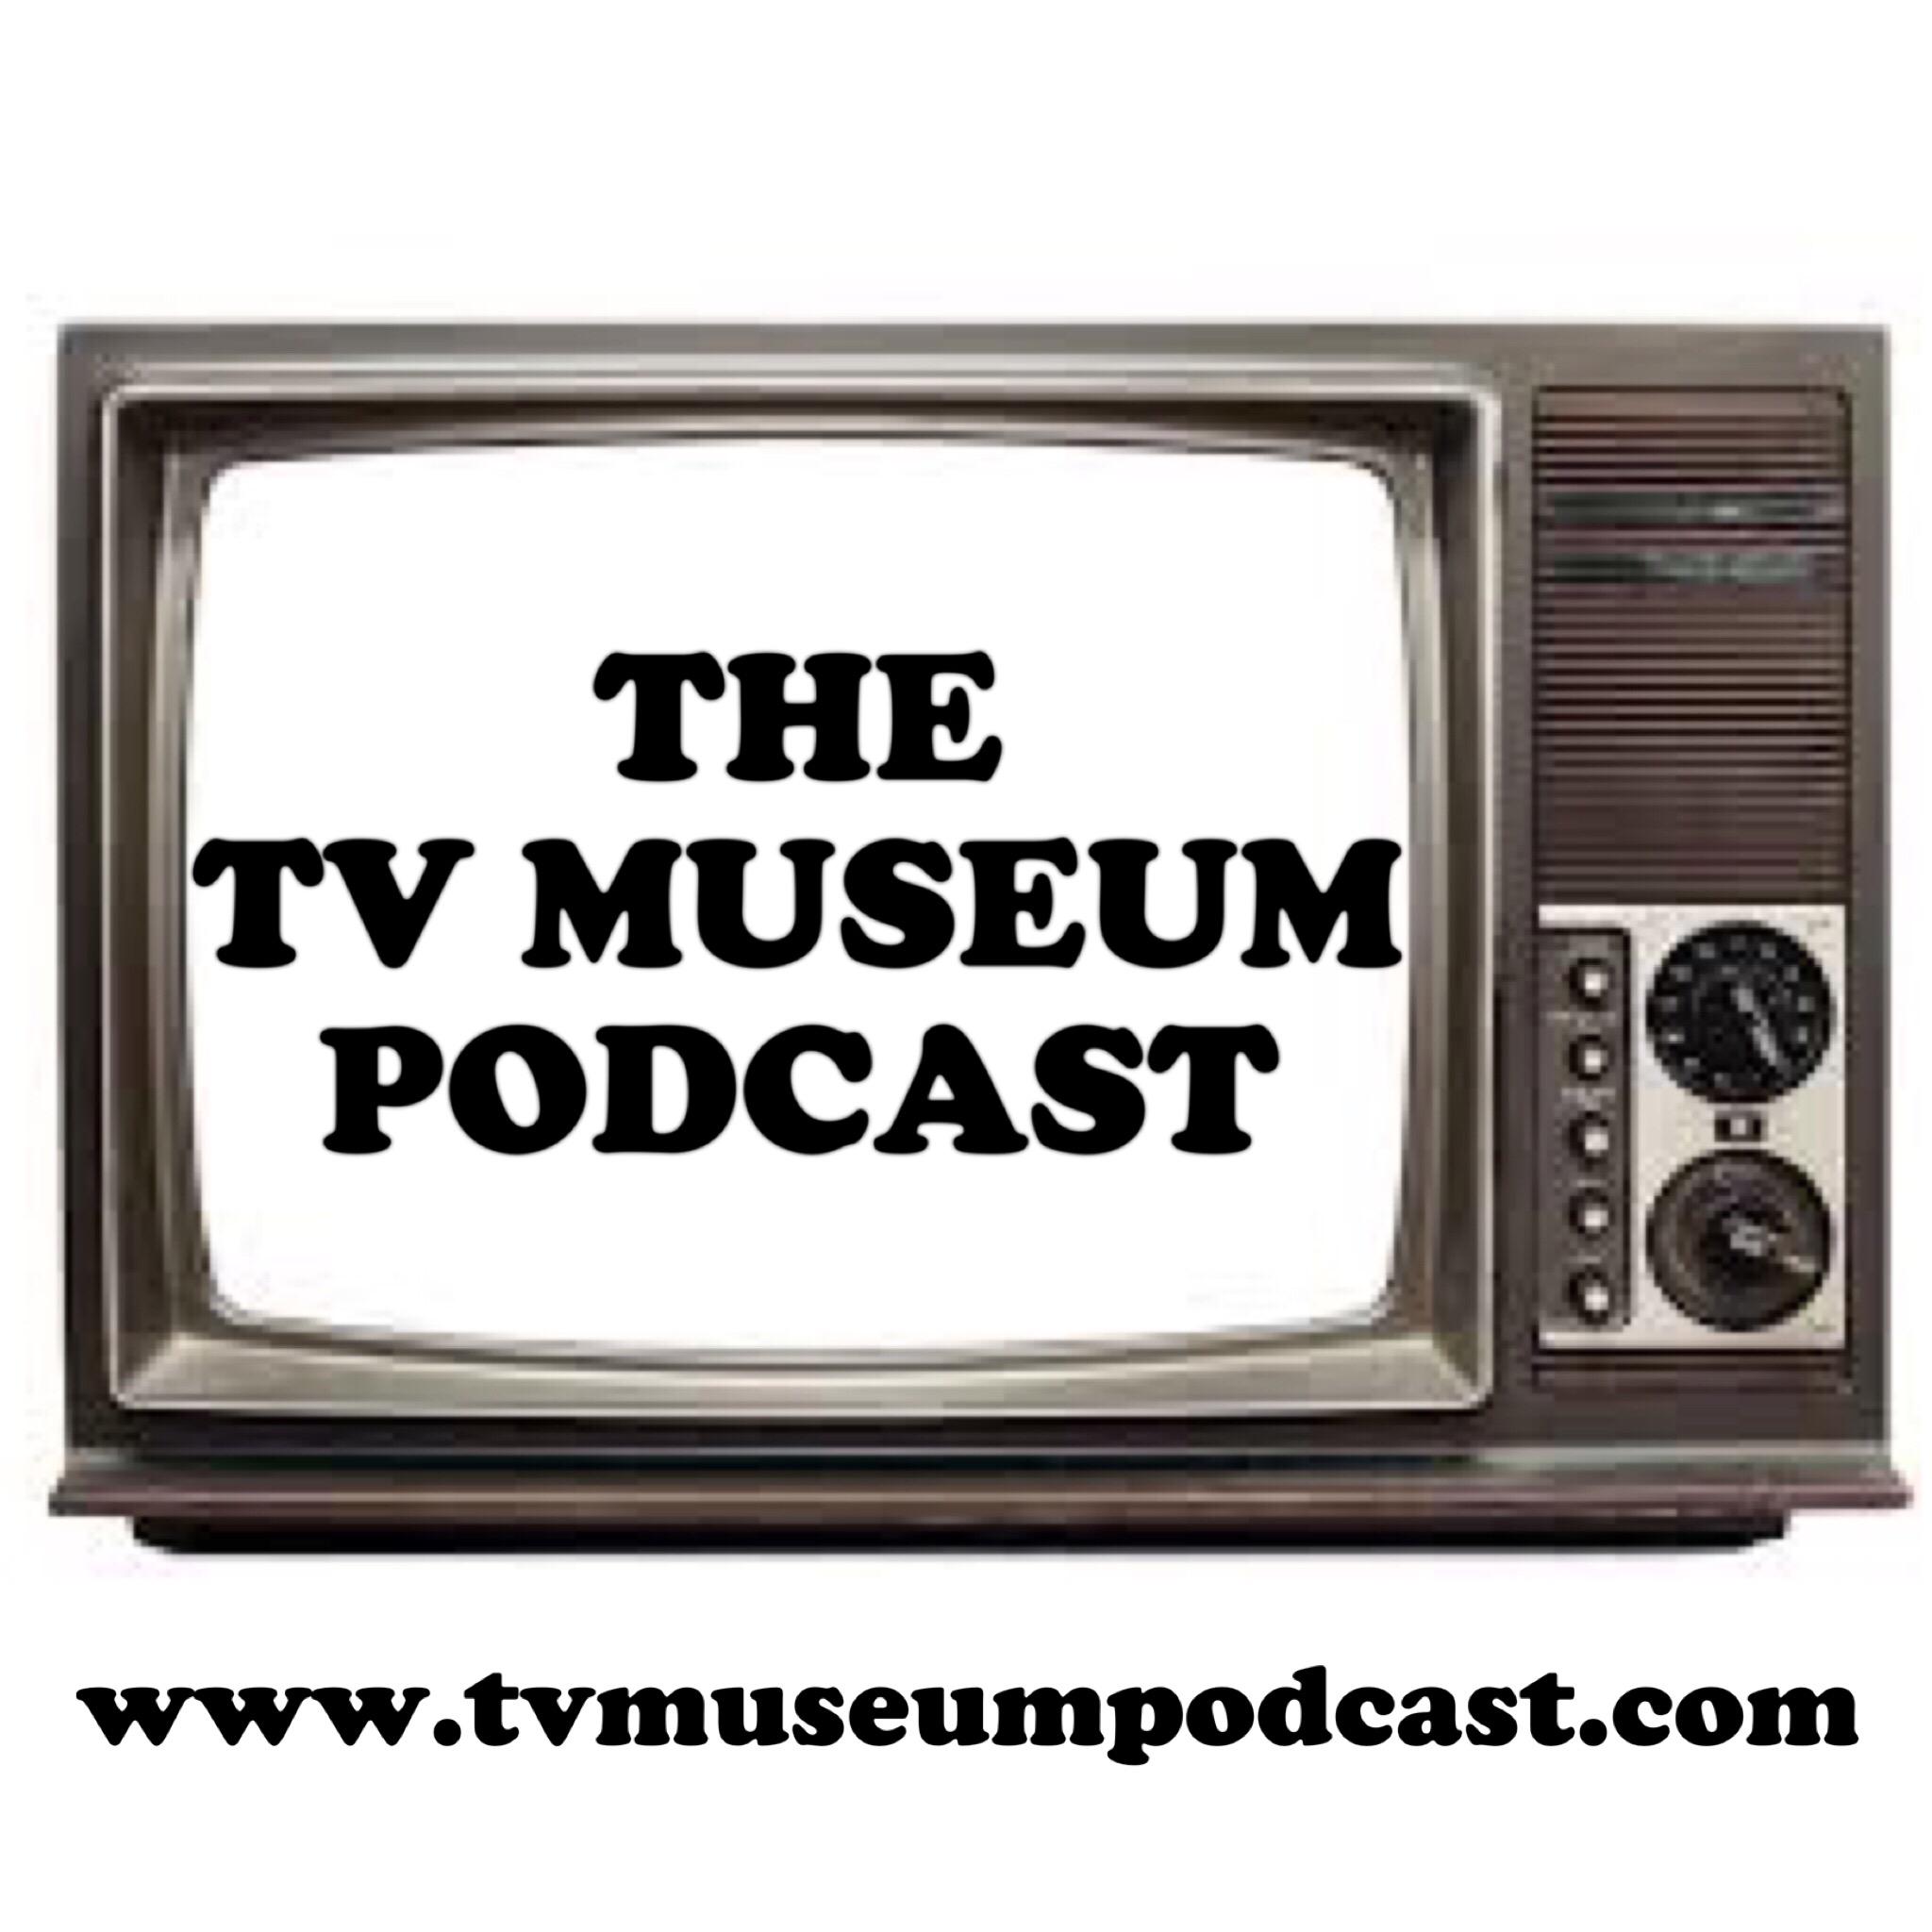 The TV Museum Podcast show art